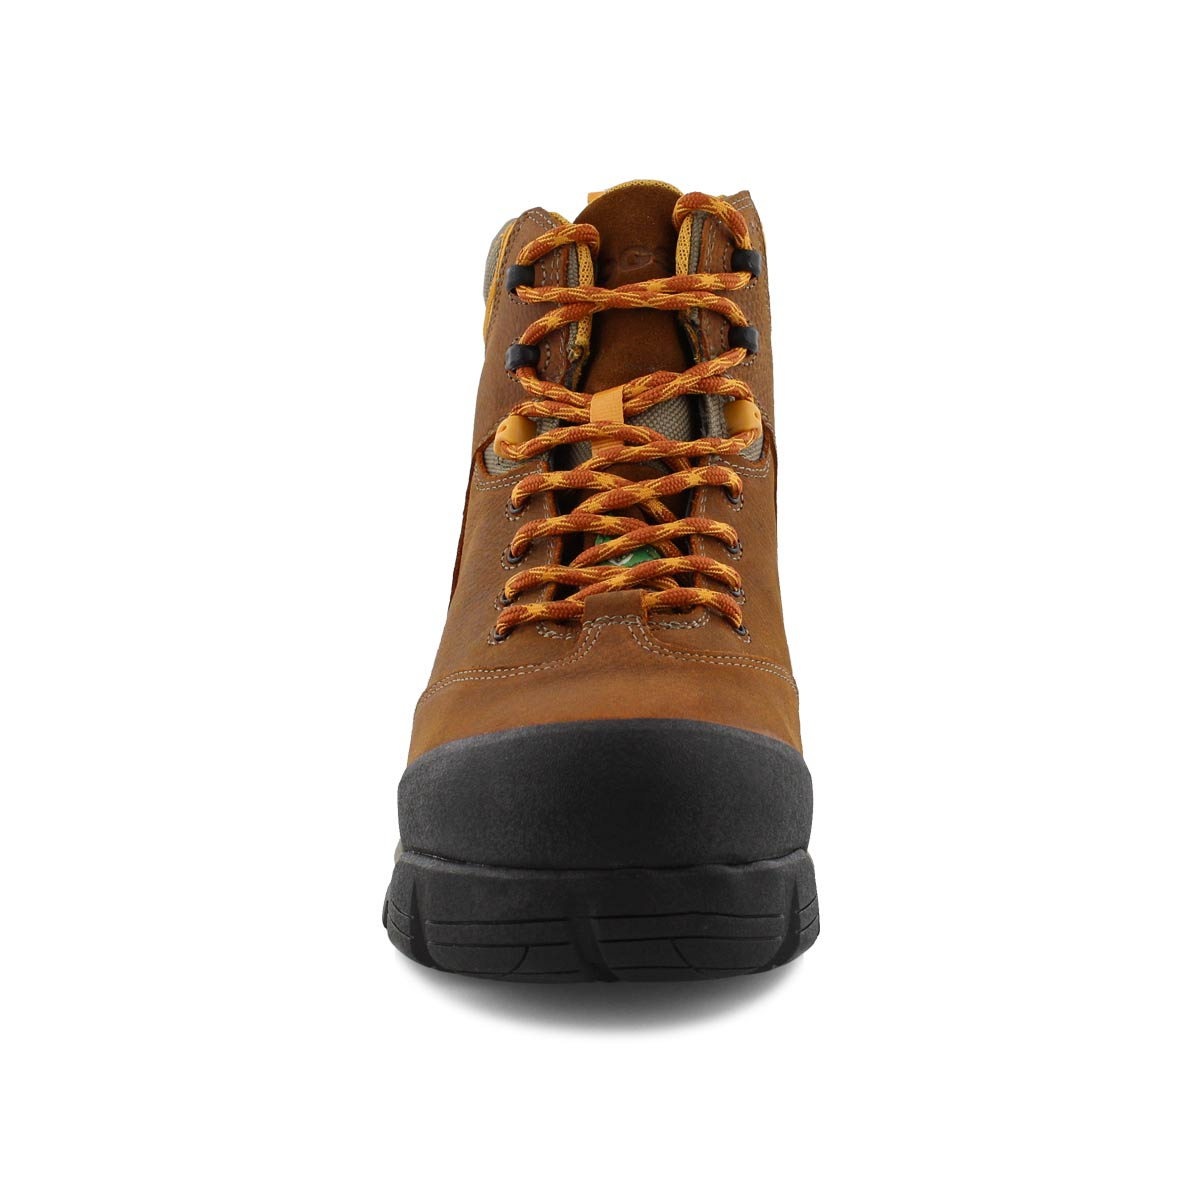 Mns Bedrock Mid PP CSA wtpf brown boot